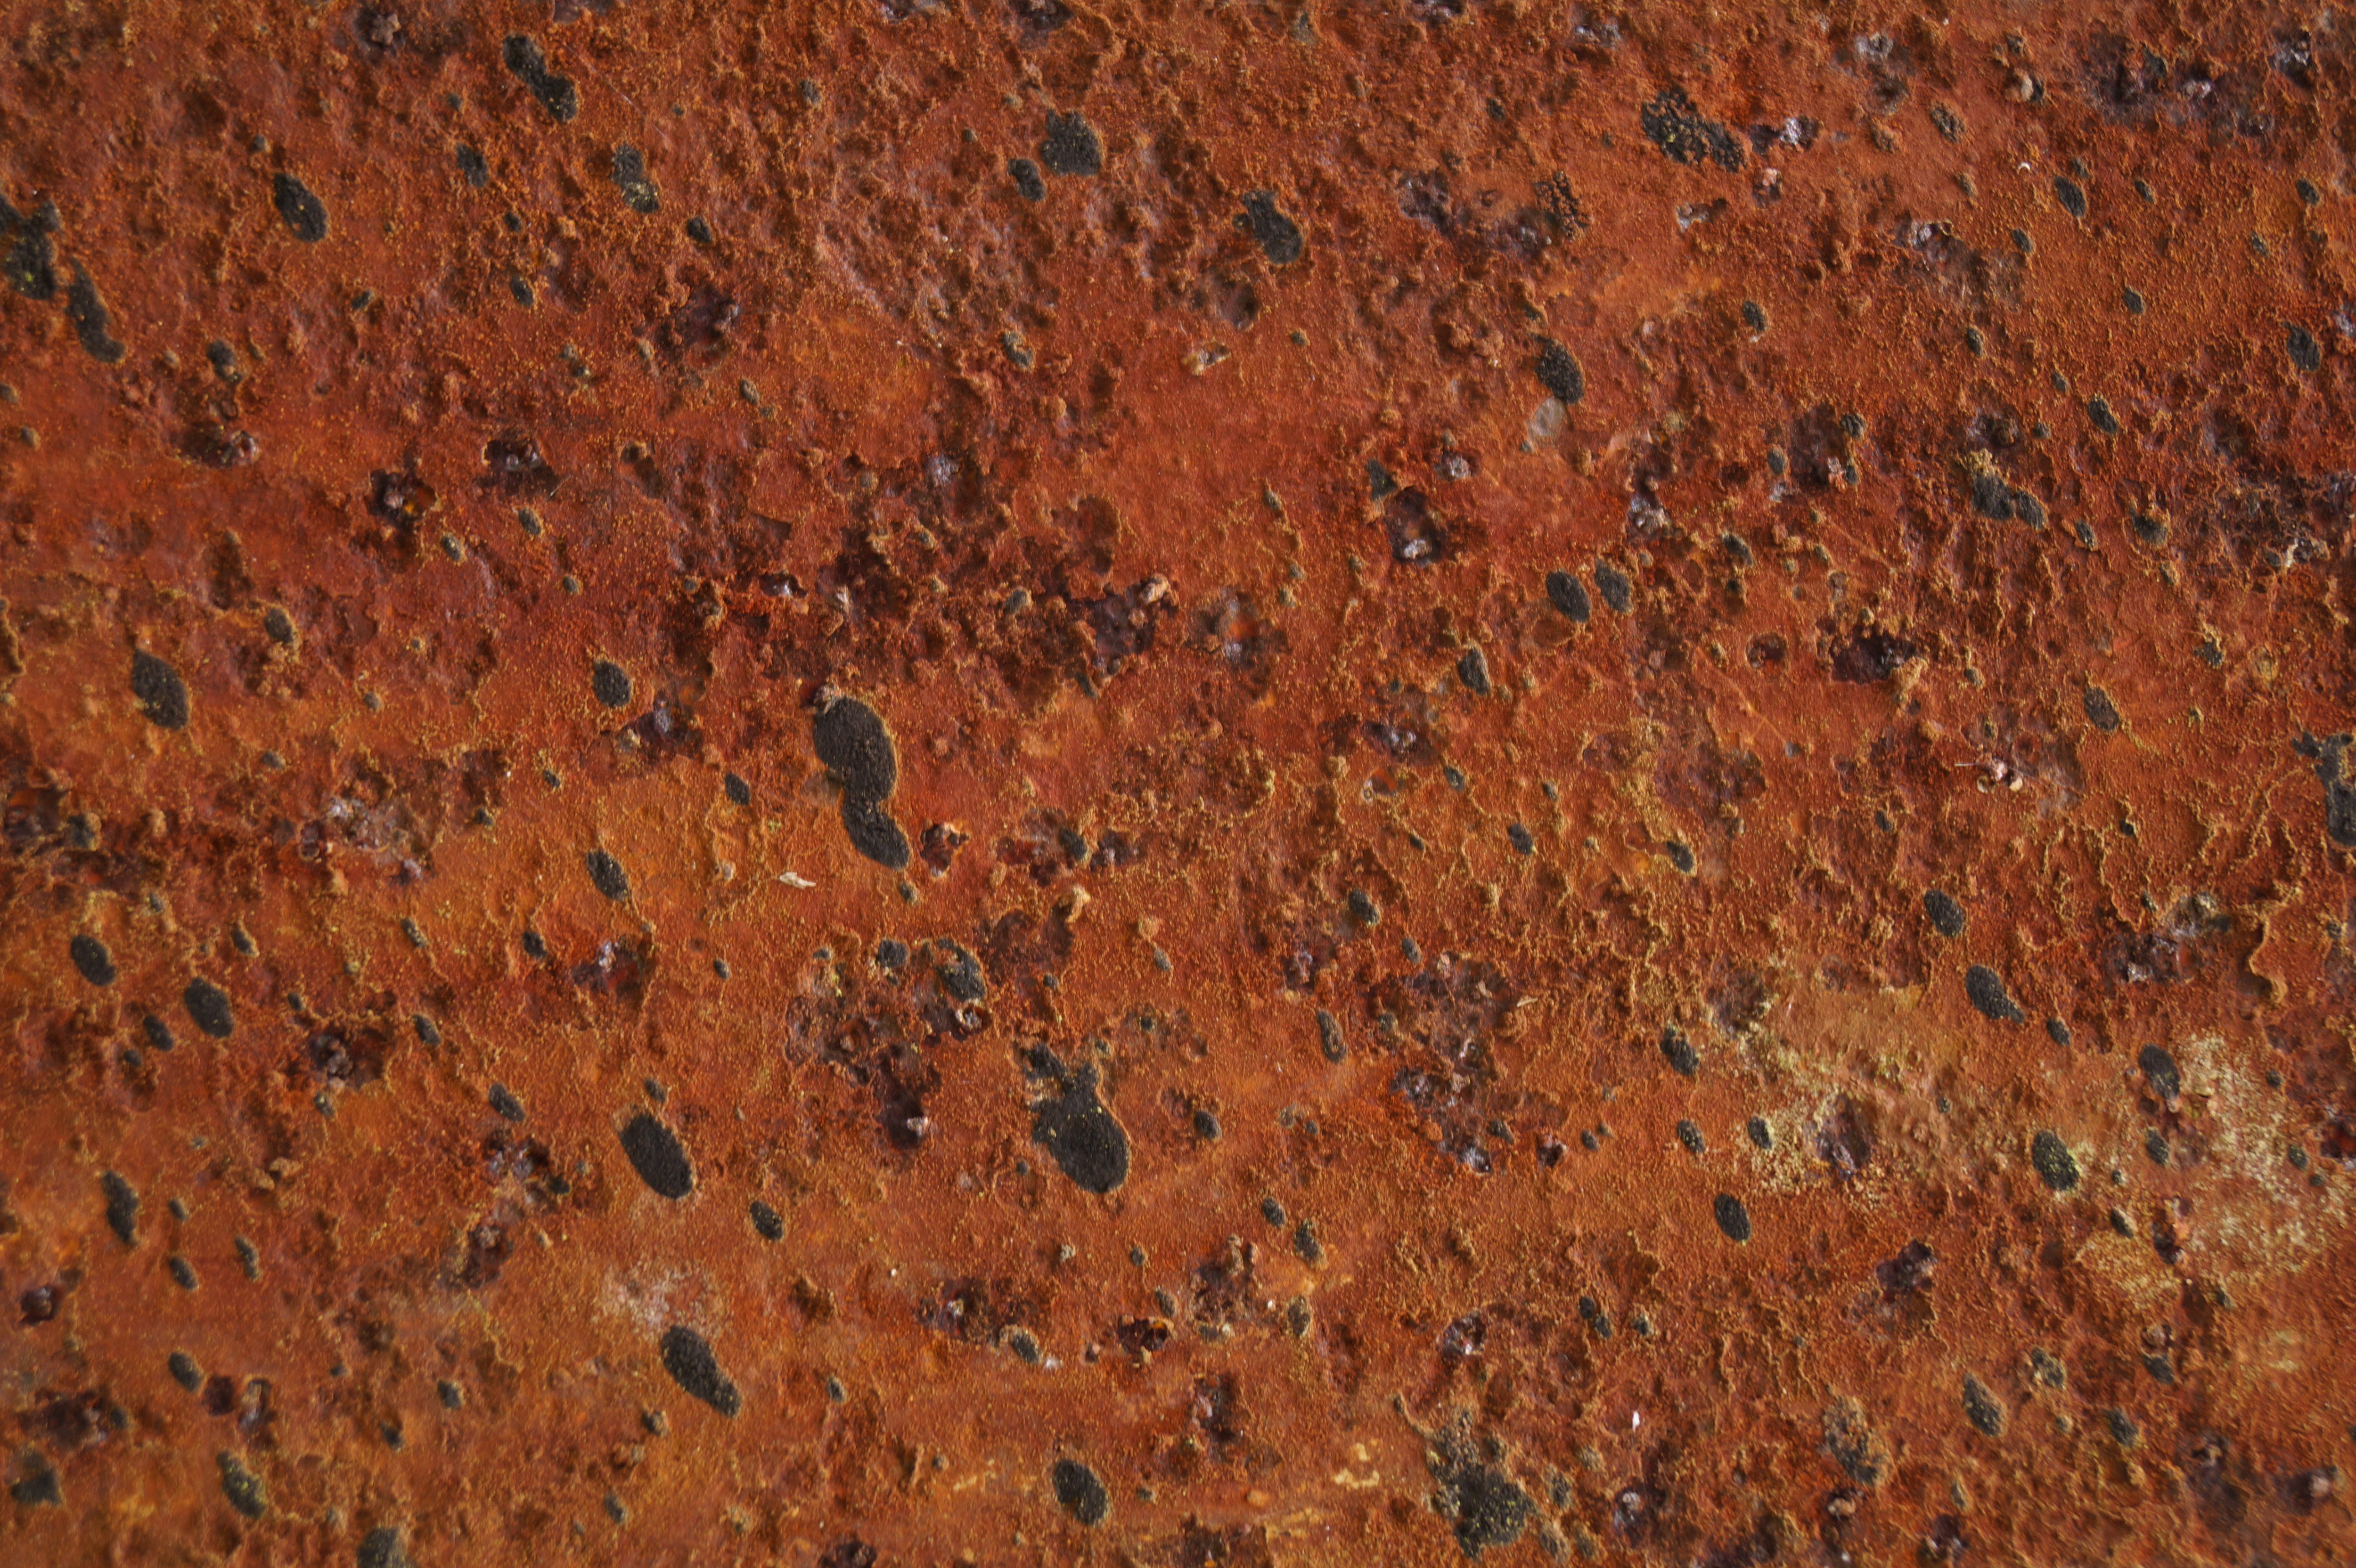 Rusty texture, Rusty texture